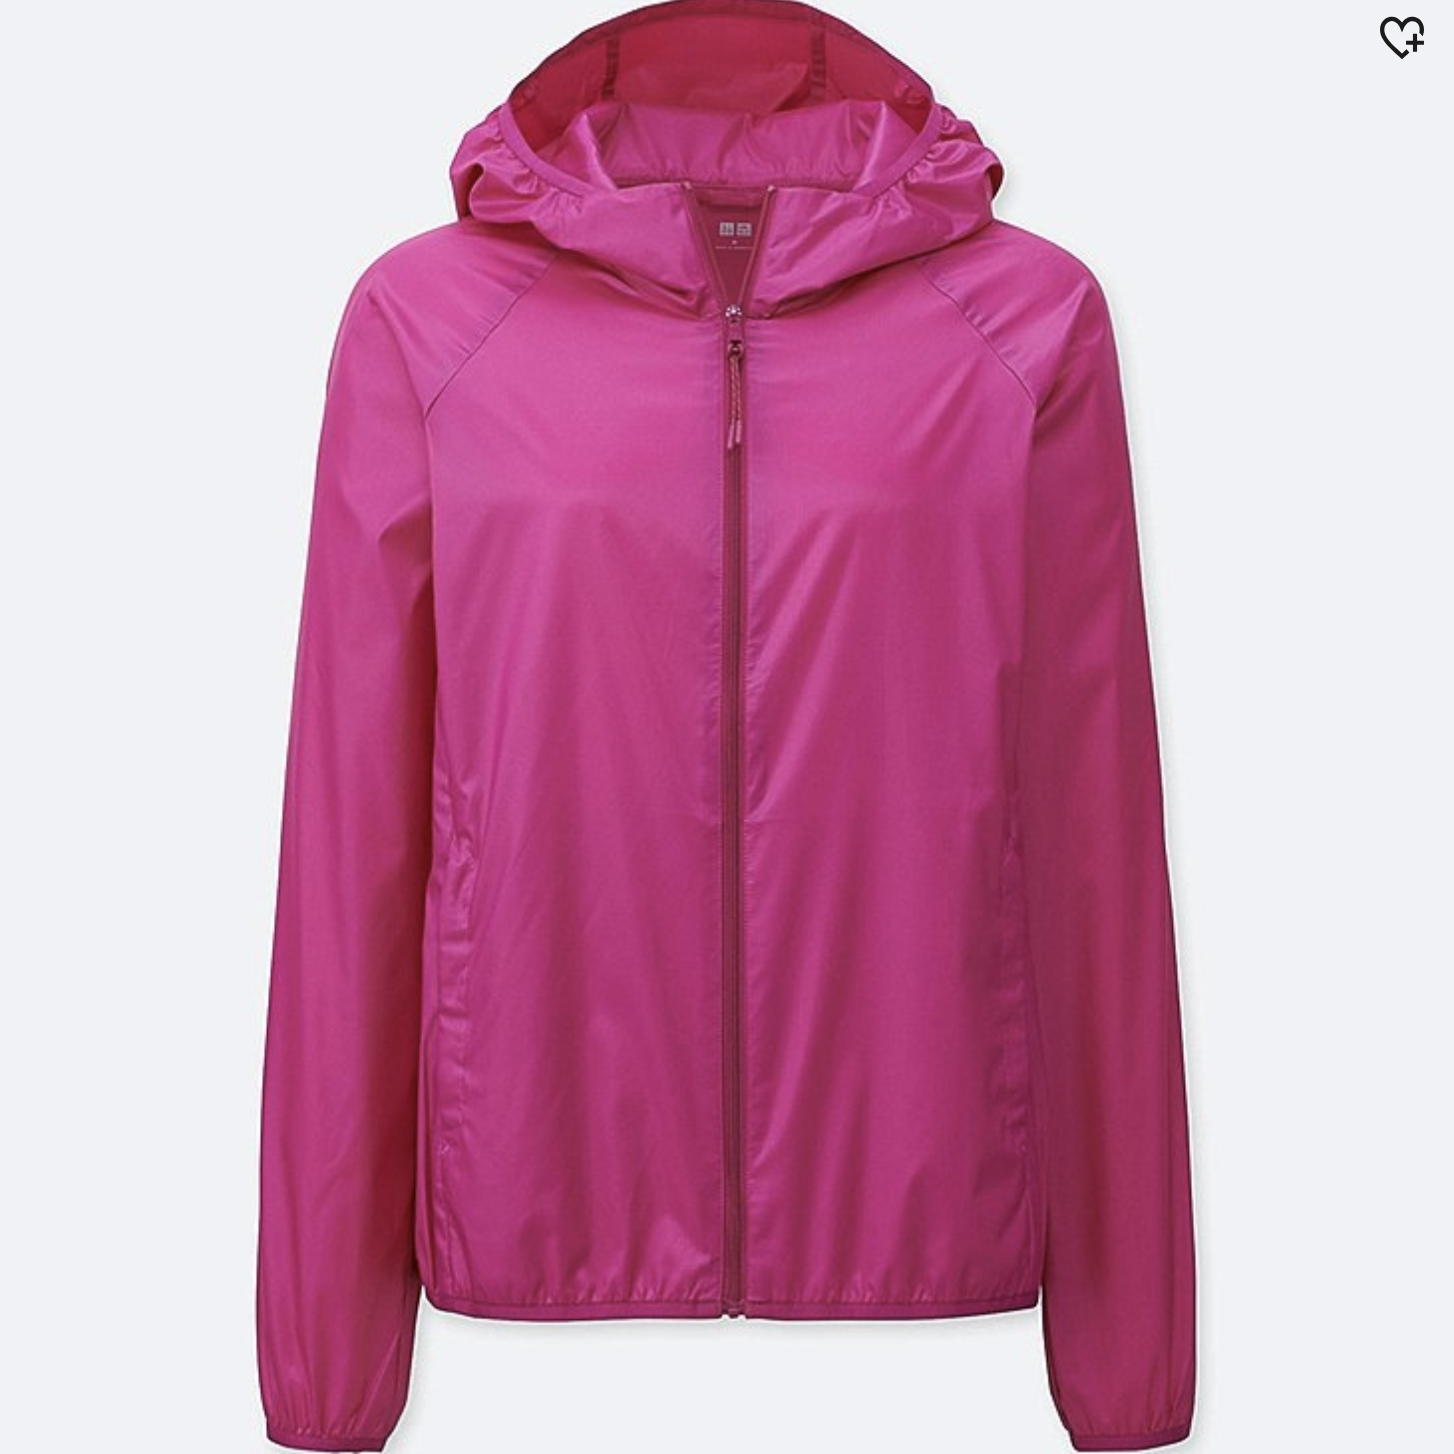 Lightweight Packable Hooded Jacket